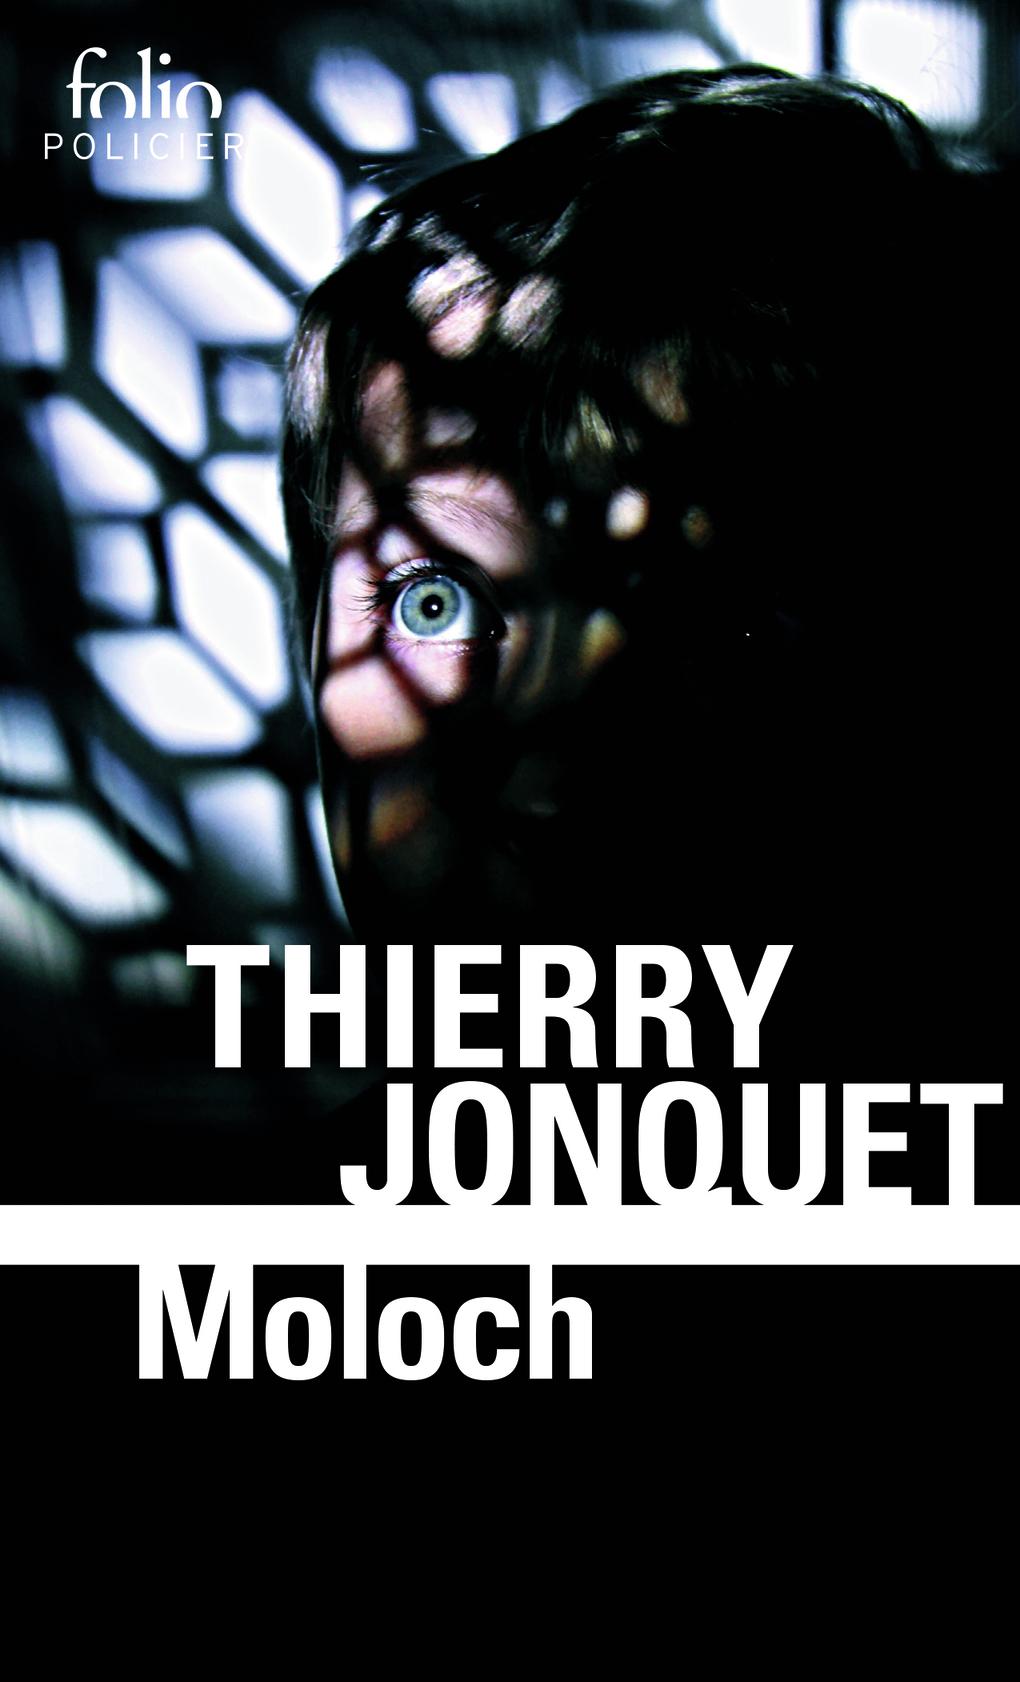 Moloch | Jonquet, Thierry